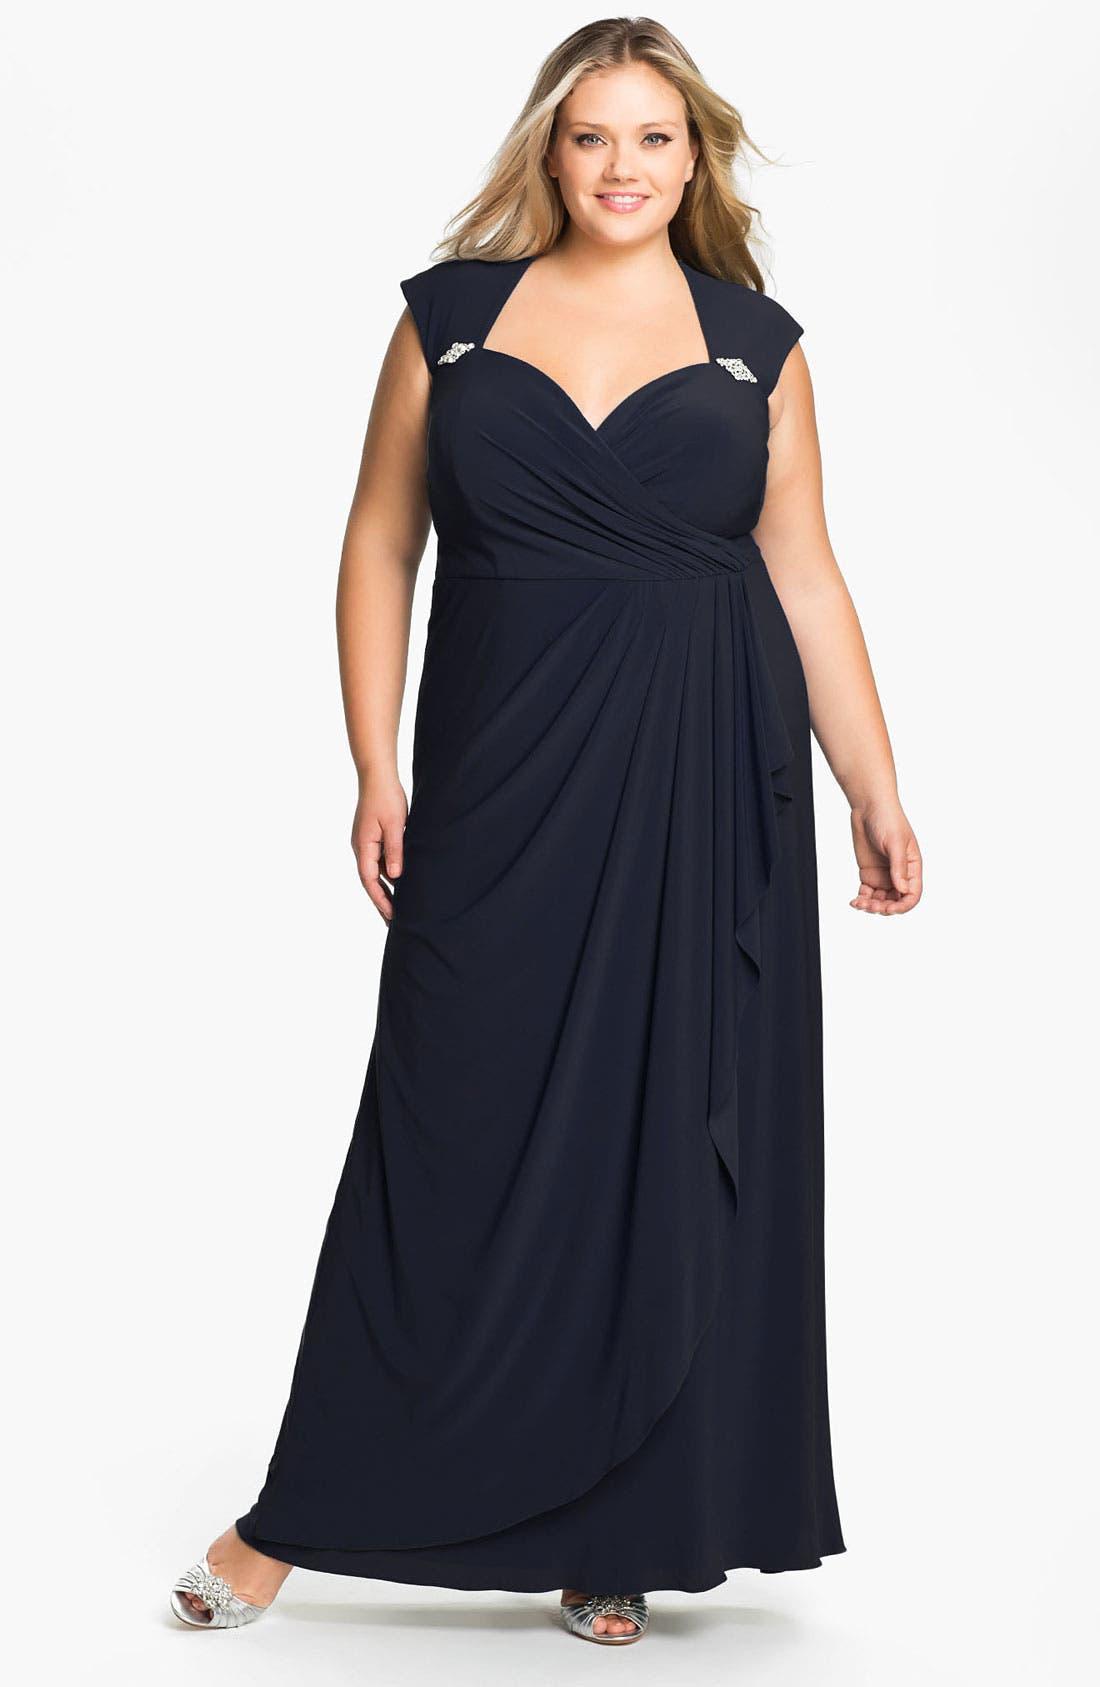 Alternate Image 1 Selected - Xscape Cap Sleeve Draped Mesh Gown (Plus)